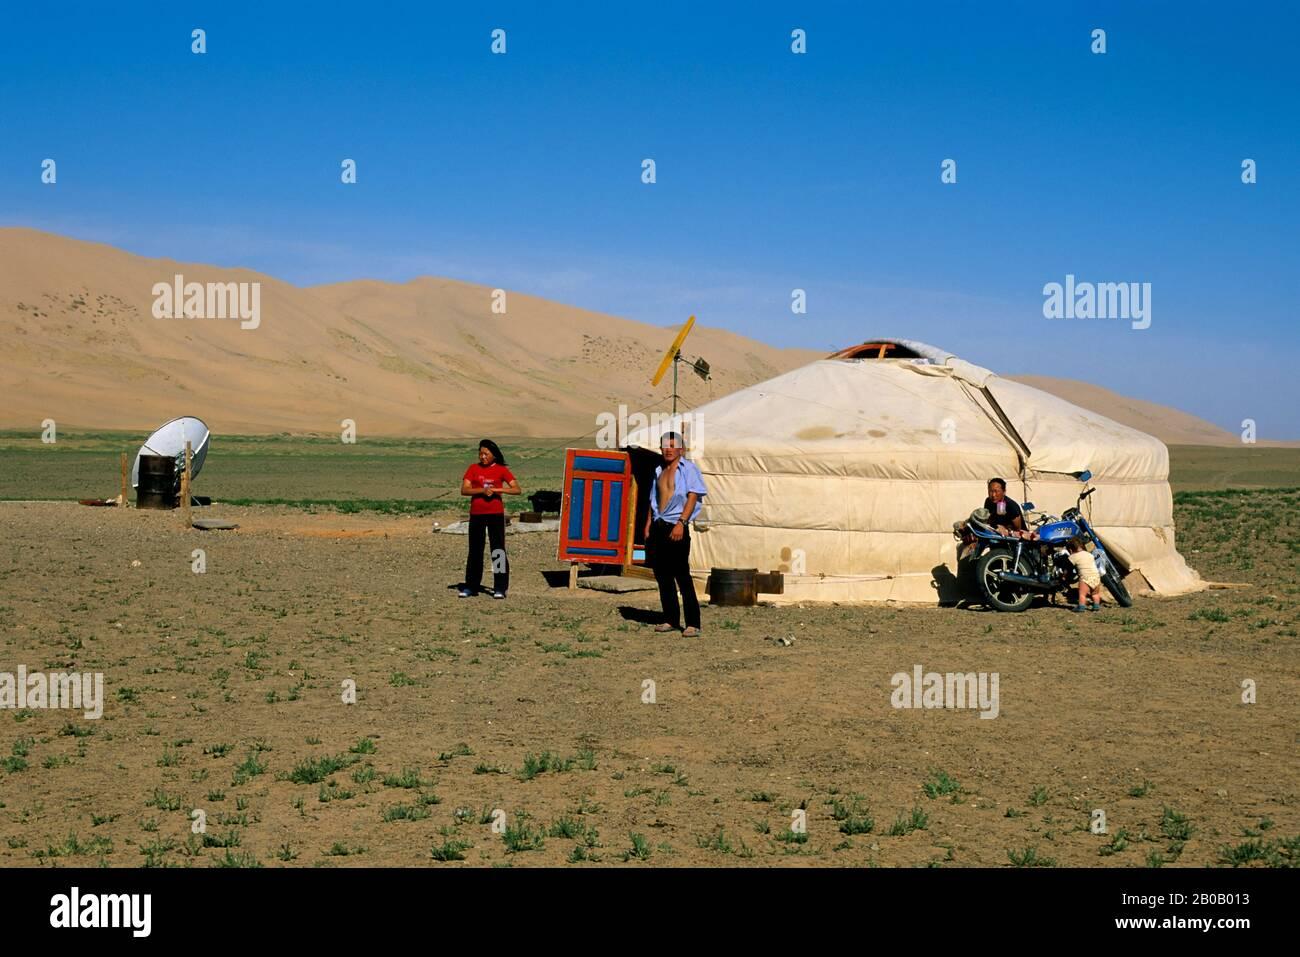 MONGOLIA, CERCA DE DALANZADGAD, DESIERTO DE GOBI EN KHONGORYN ELS (DUNAS DE ARENA), GER (YURT), FAMILIA Foto de stock